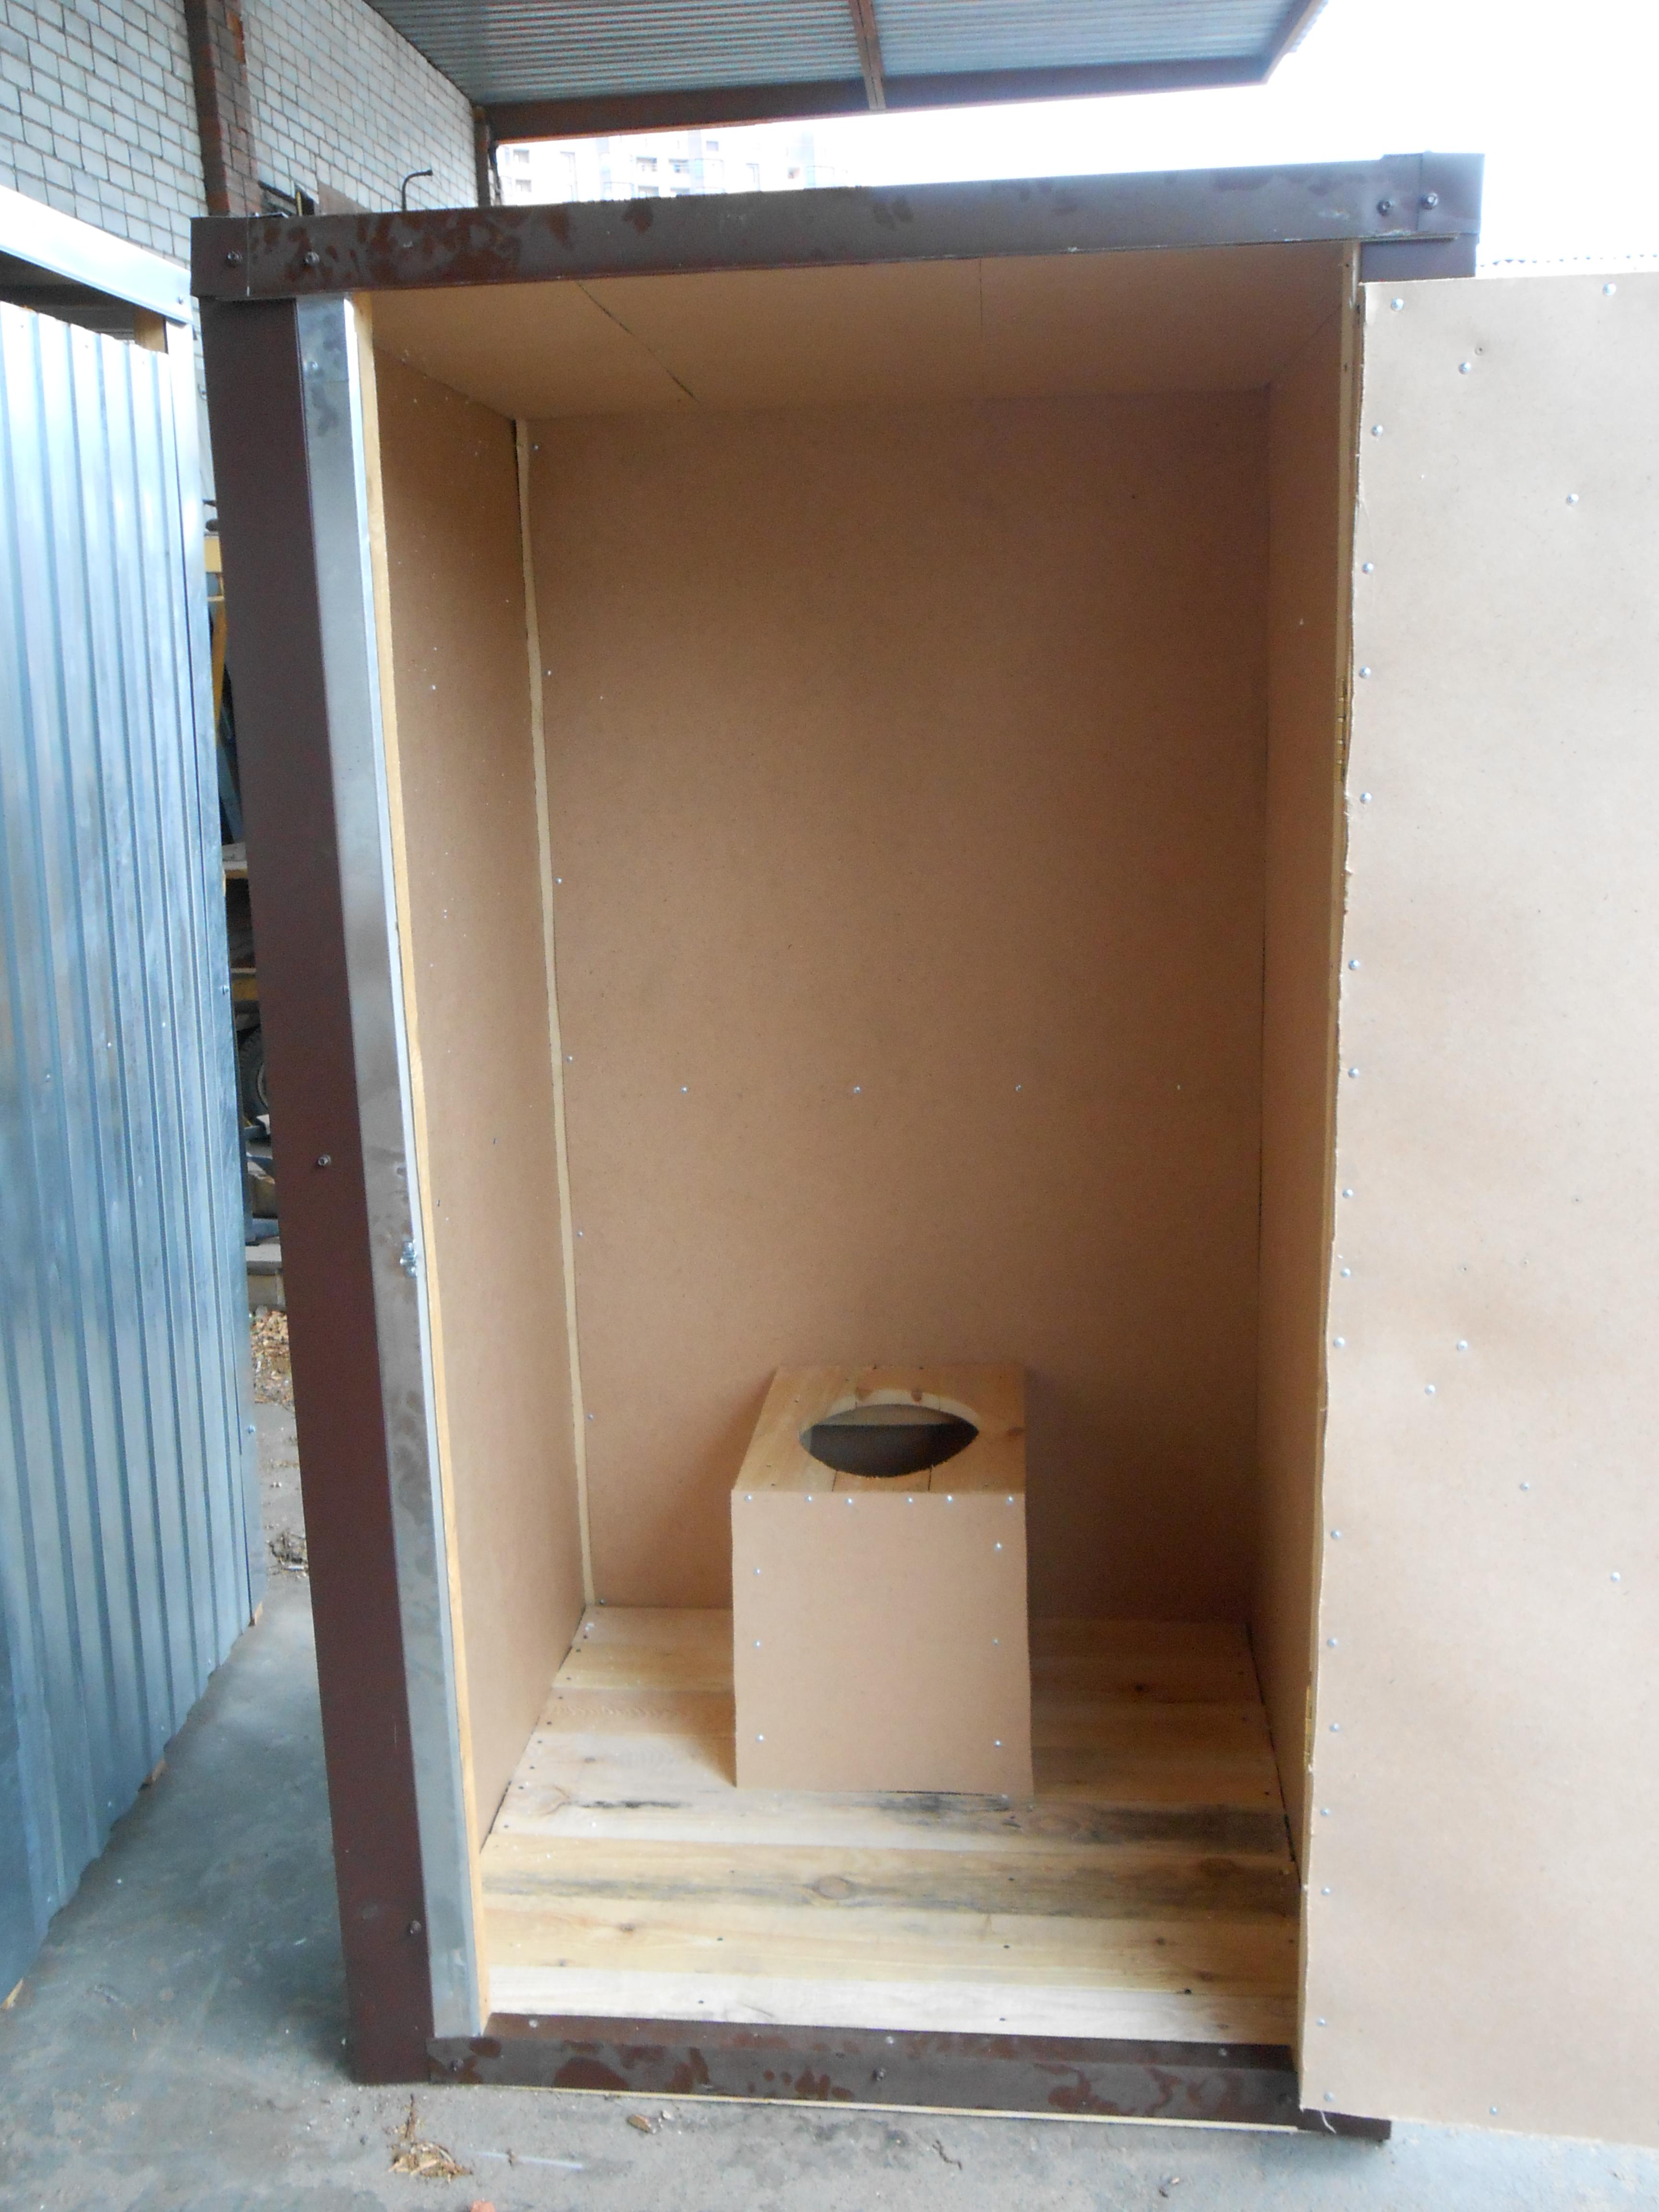 цена дачный туалет воронеж